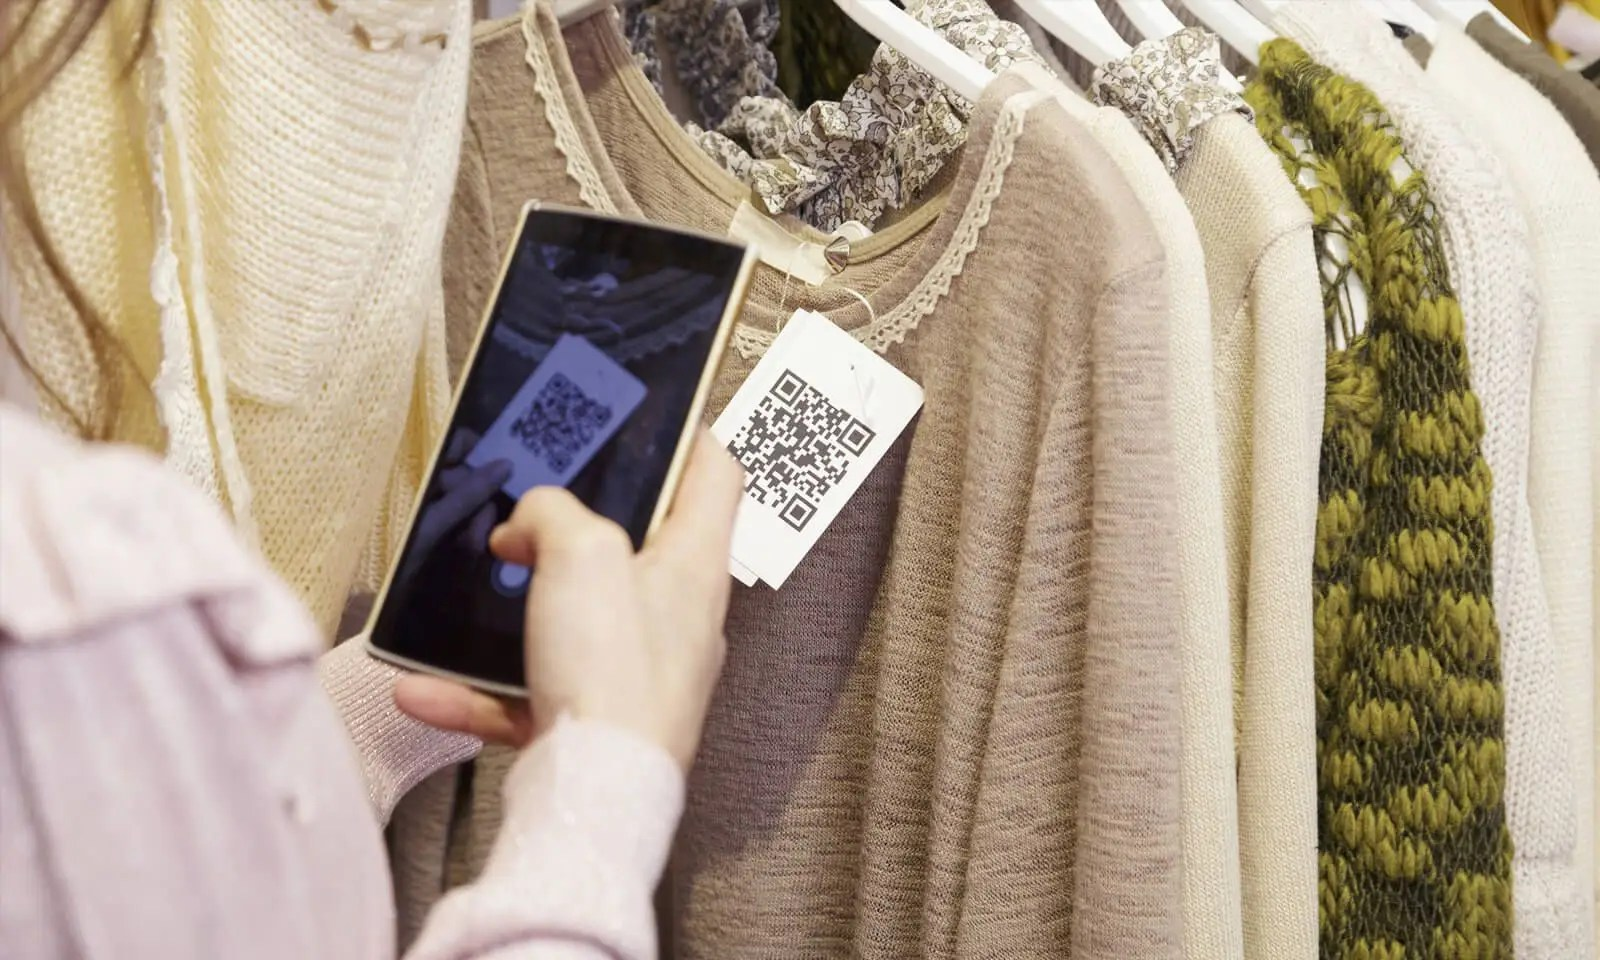 Las mejores herramientas de E-commerce para empresas para esté 2020